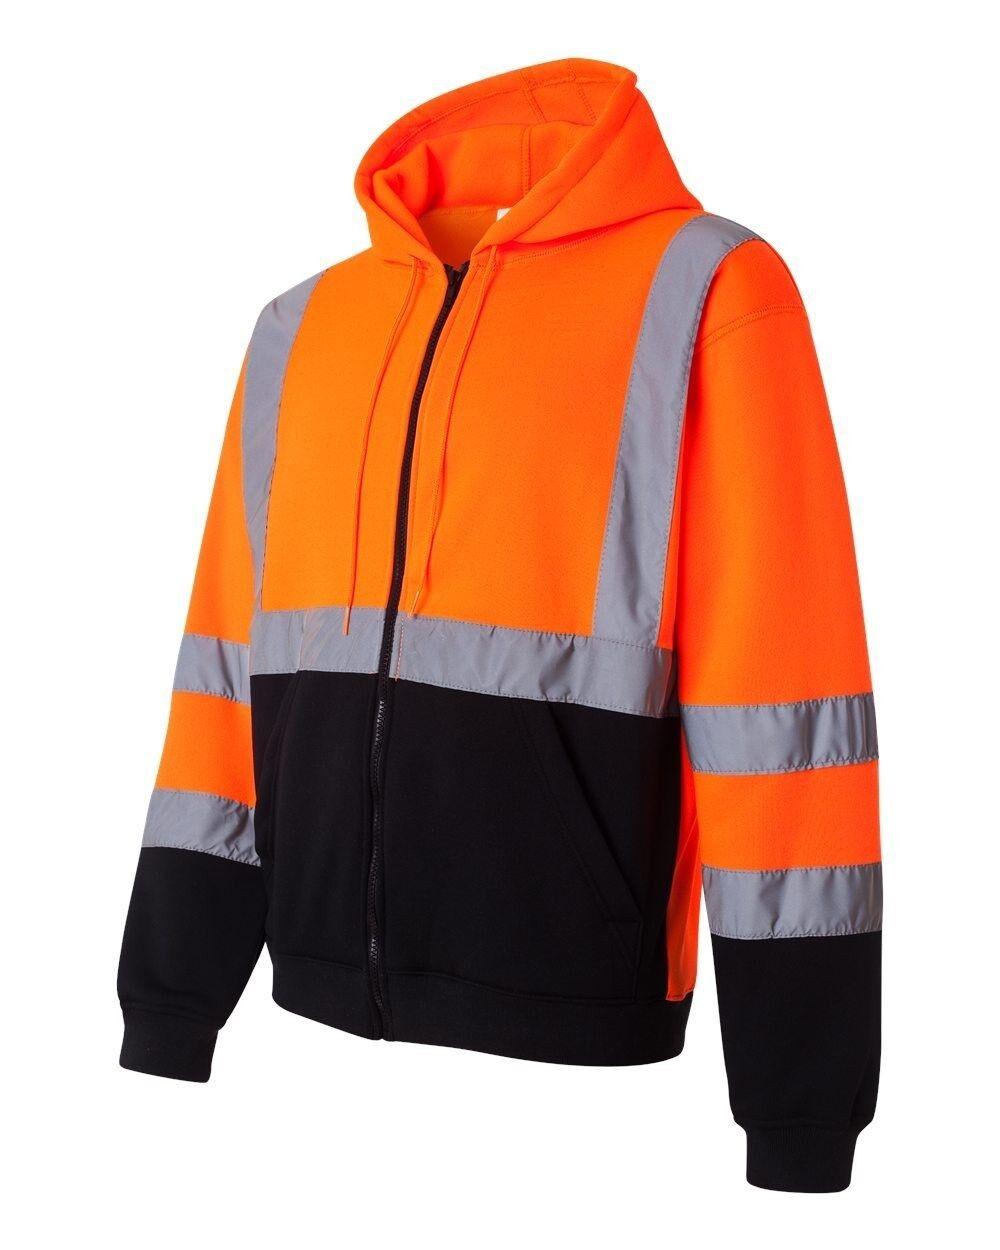 ML Kishigo JS103 Orange Hi-Vis Hooded Sweatshirt Size M-5XL *Free US Shipping* Activewear